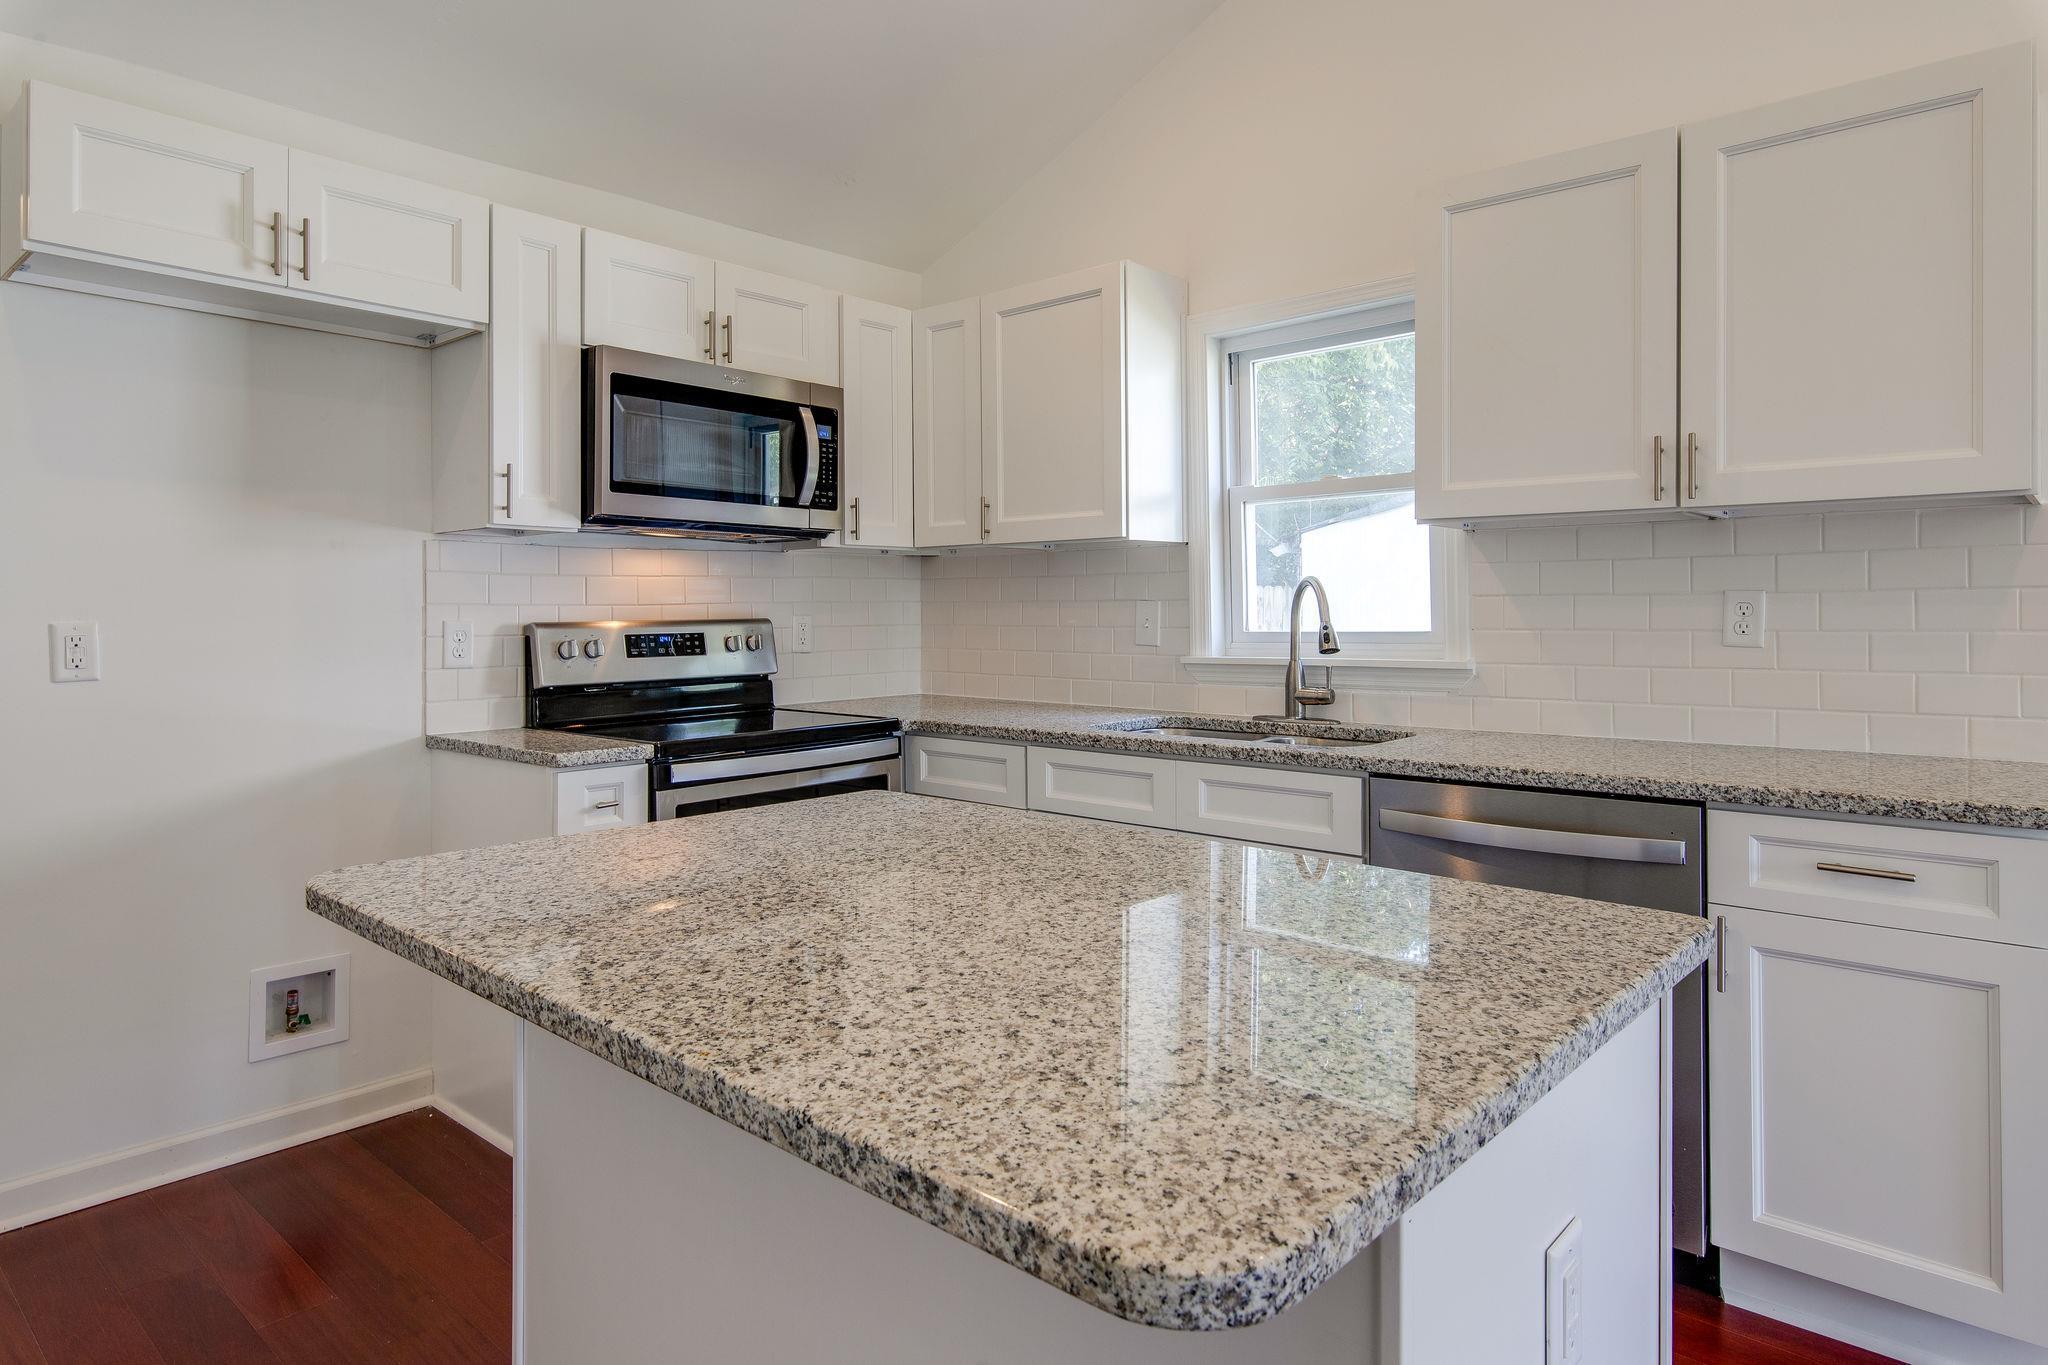 803 Matthews Ave, Nashville, TN 37216 - Nashville, TN real estate listing